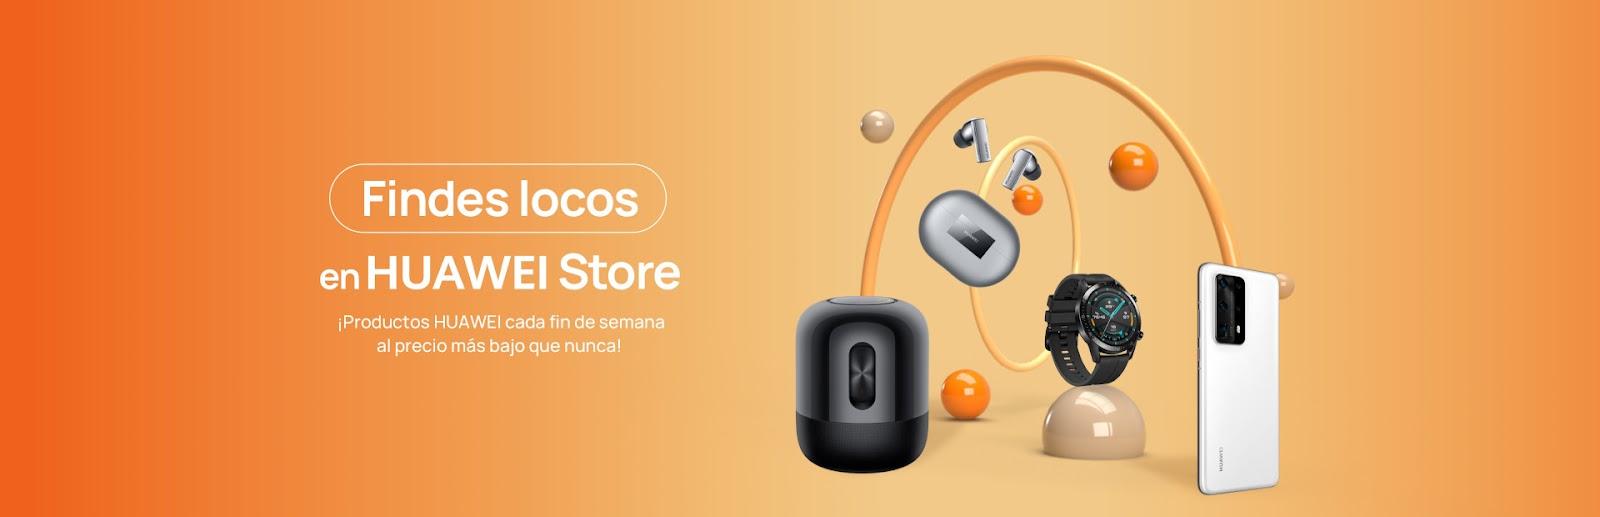 top-5-ofertas-findes-locos-24-26-septiembre-huawei-store